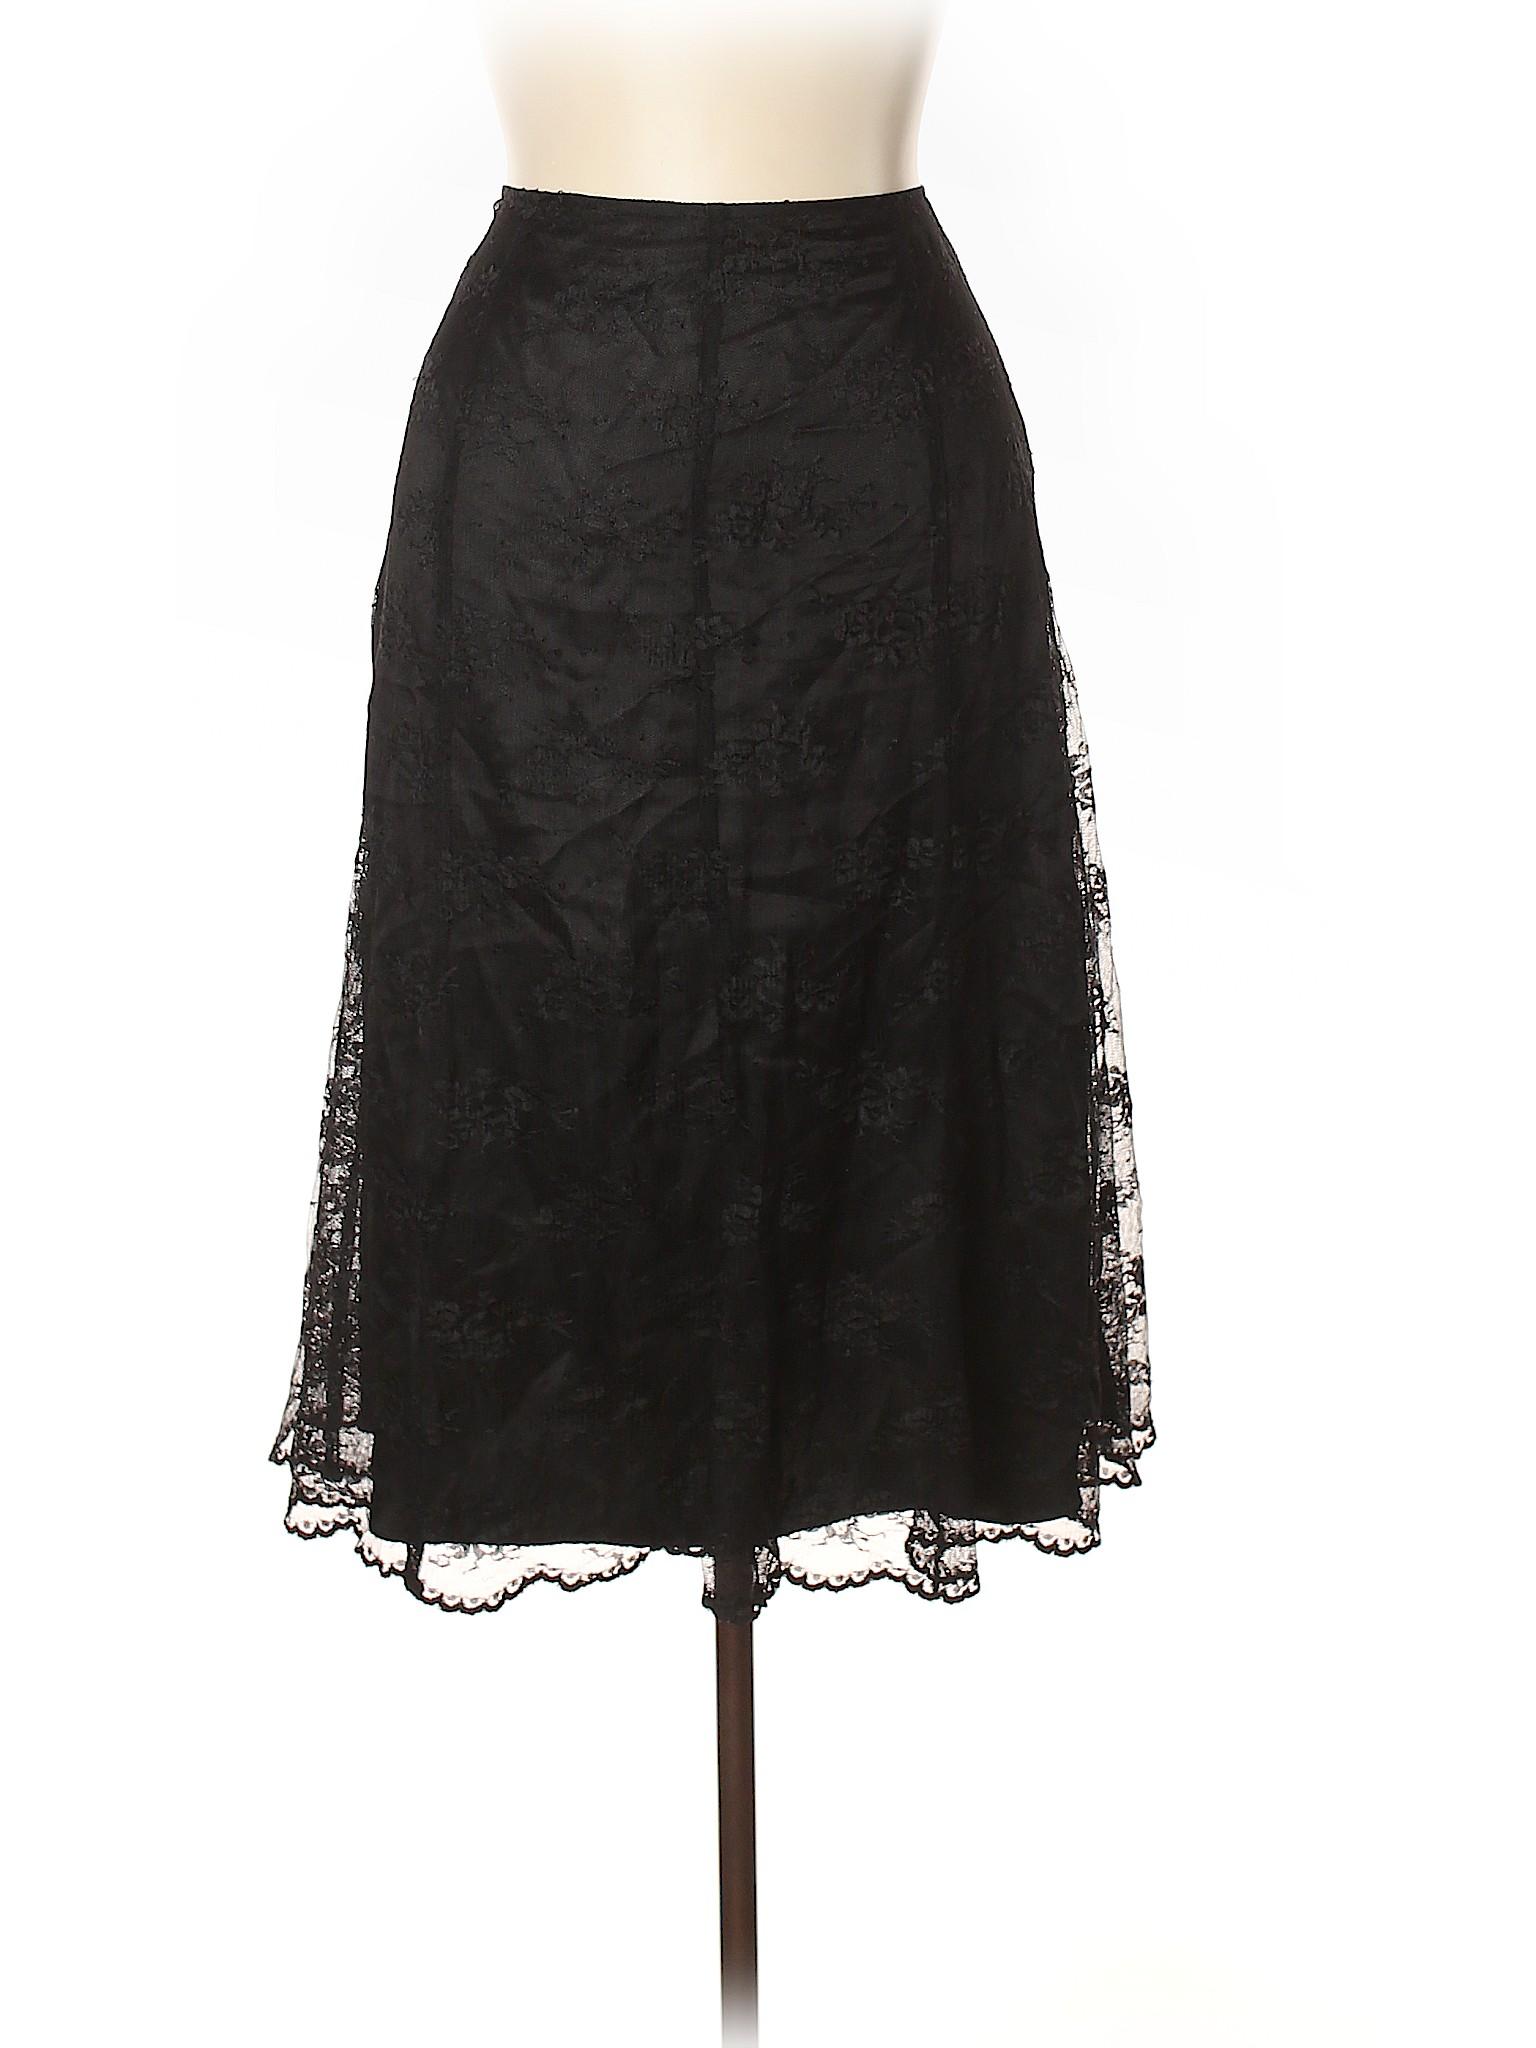 Casual leisure Boutique Boutique Skirt Cato leisure xaI6Uq